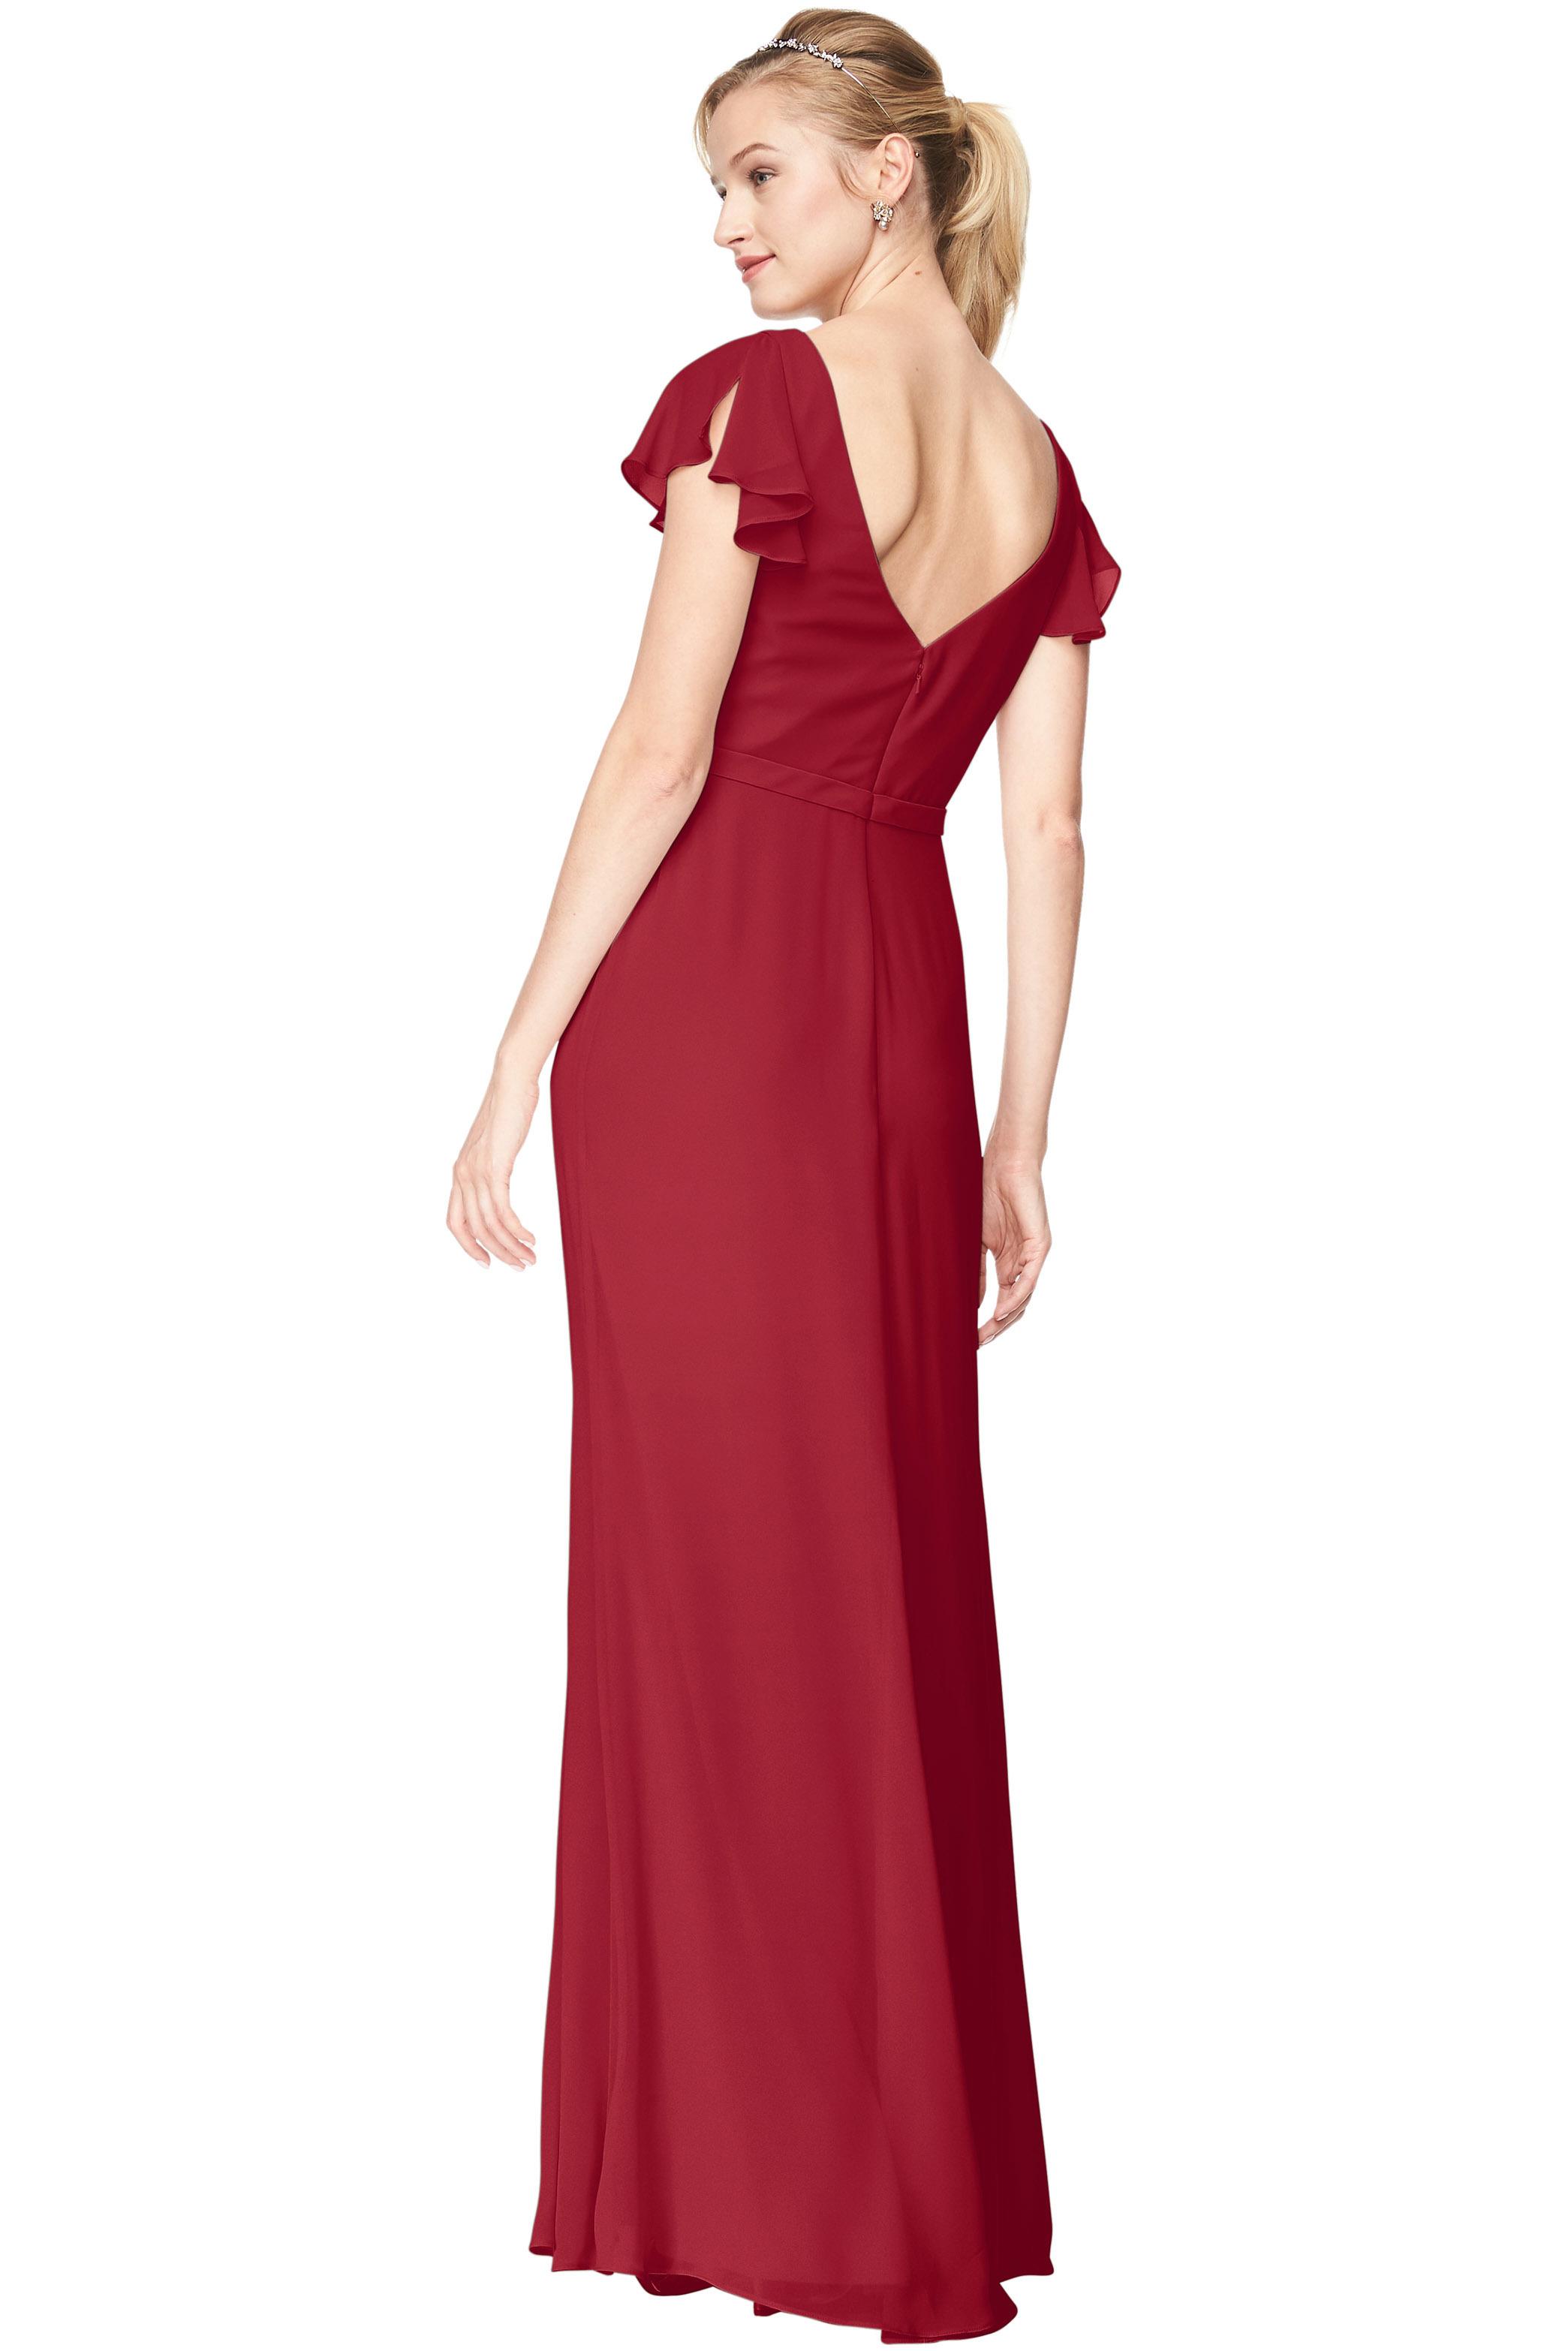 Bill Levkoff CRANBERRY Chiffon V-Neck, Cap Sleeve A-Line gown, $184.00 Back